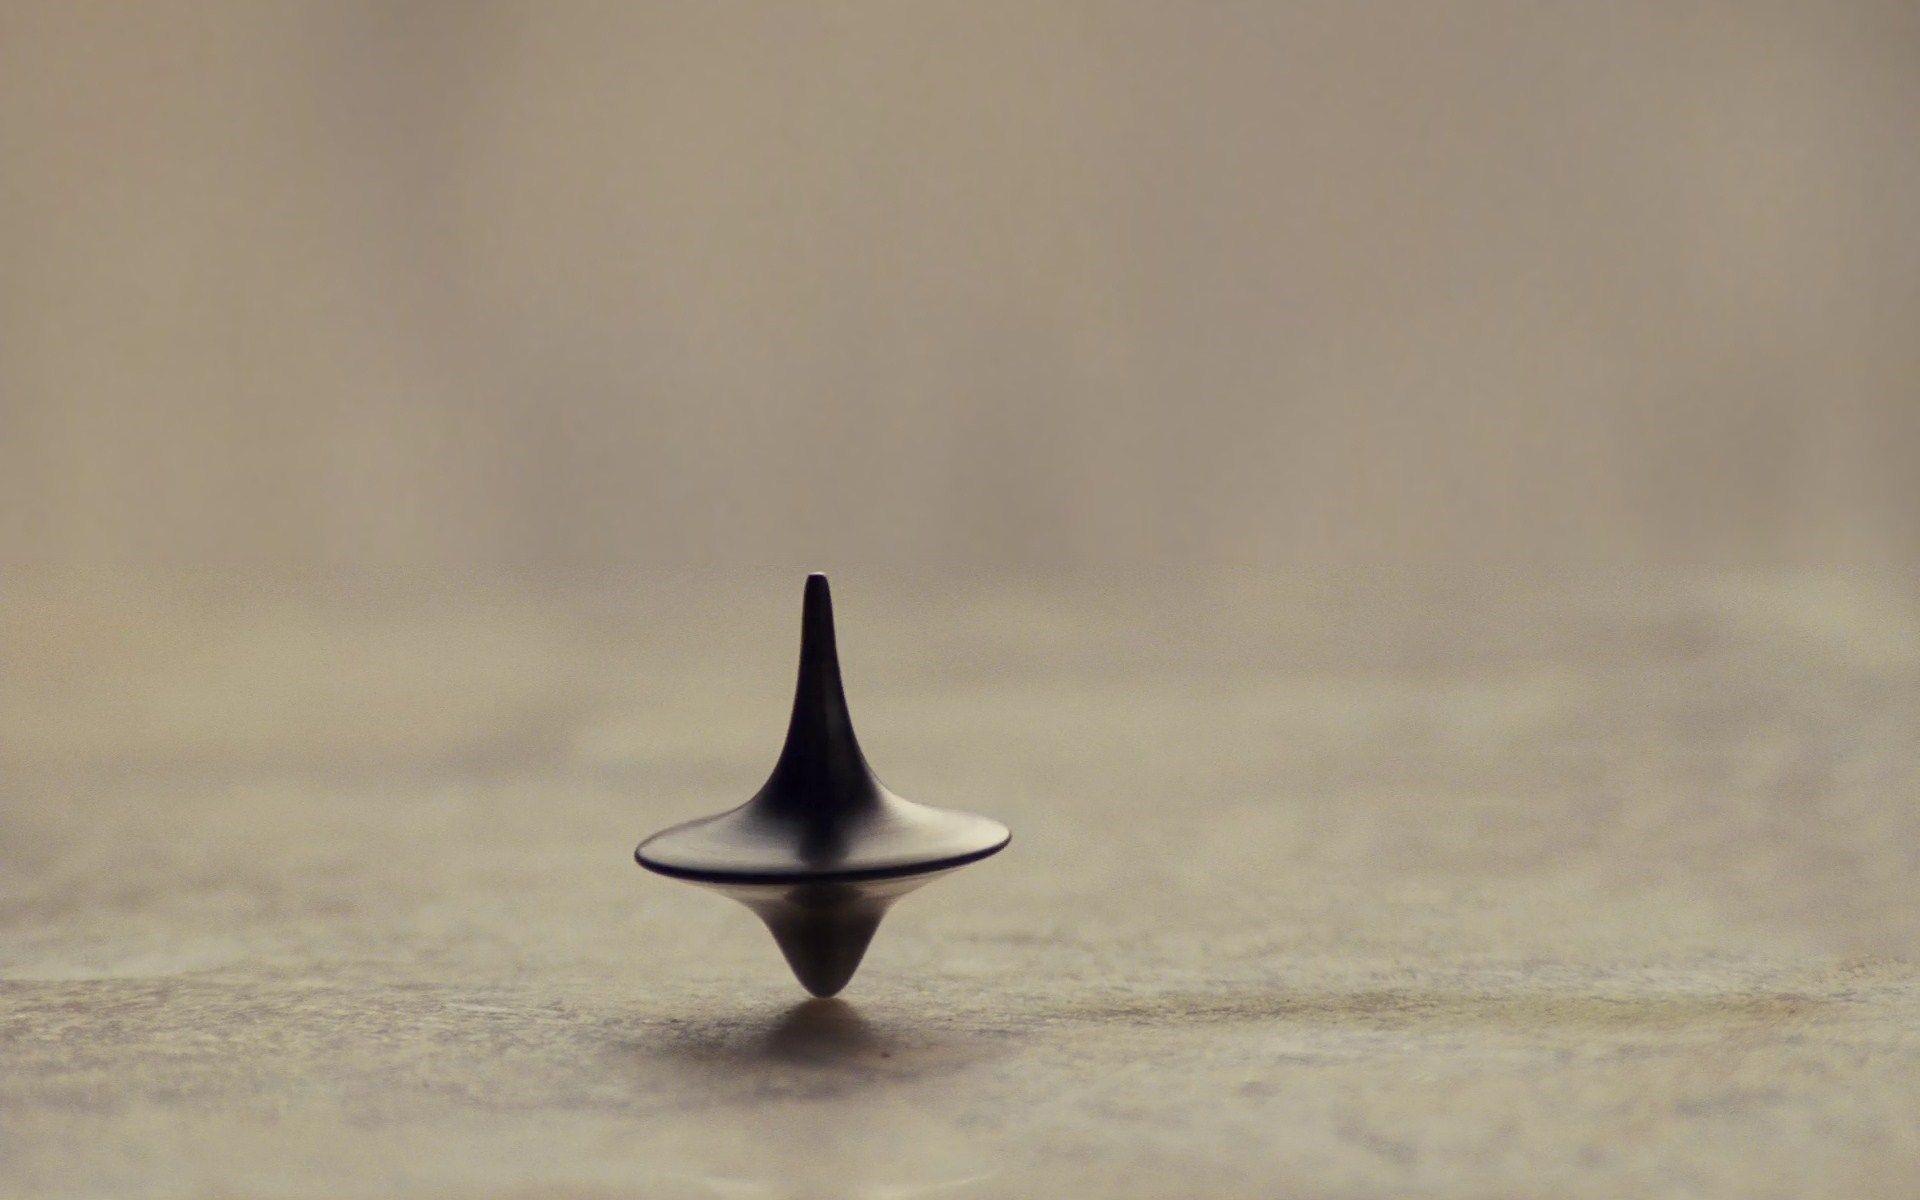 minimalist photography, spinner, mood, photo, macro, hd wallpaper